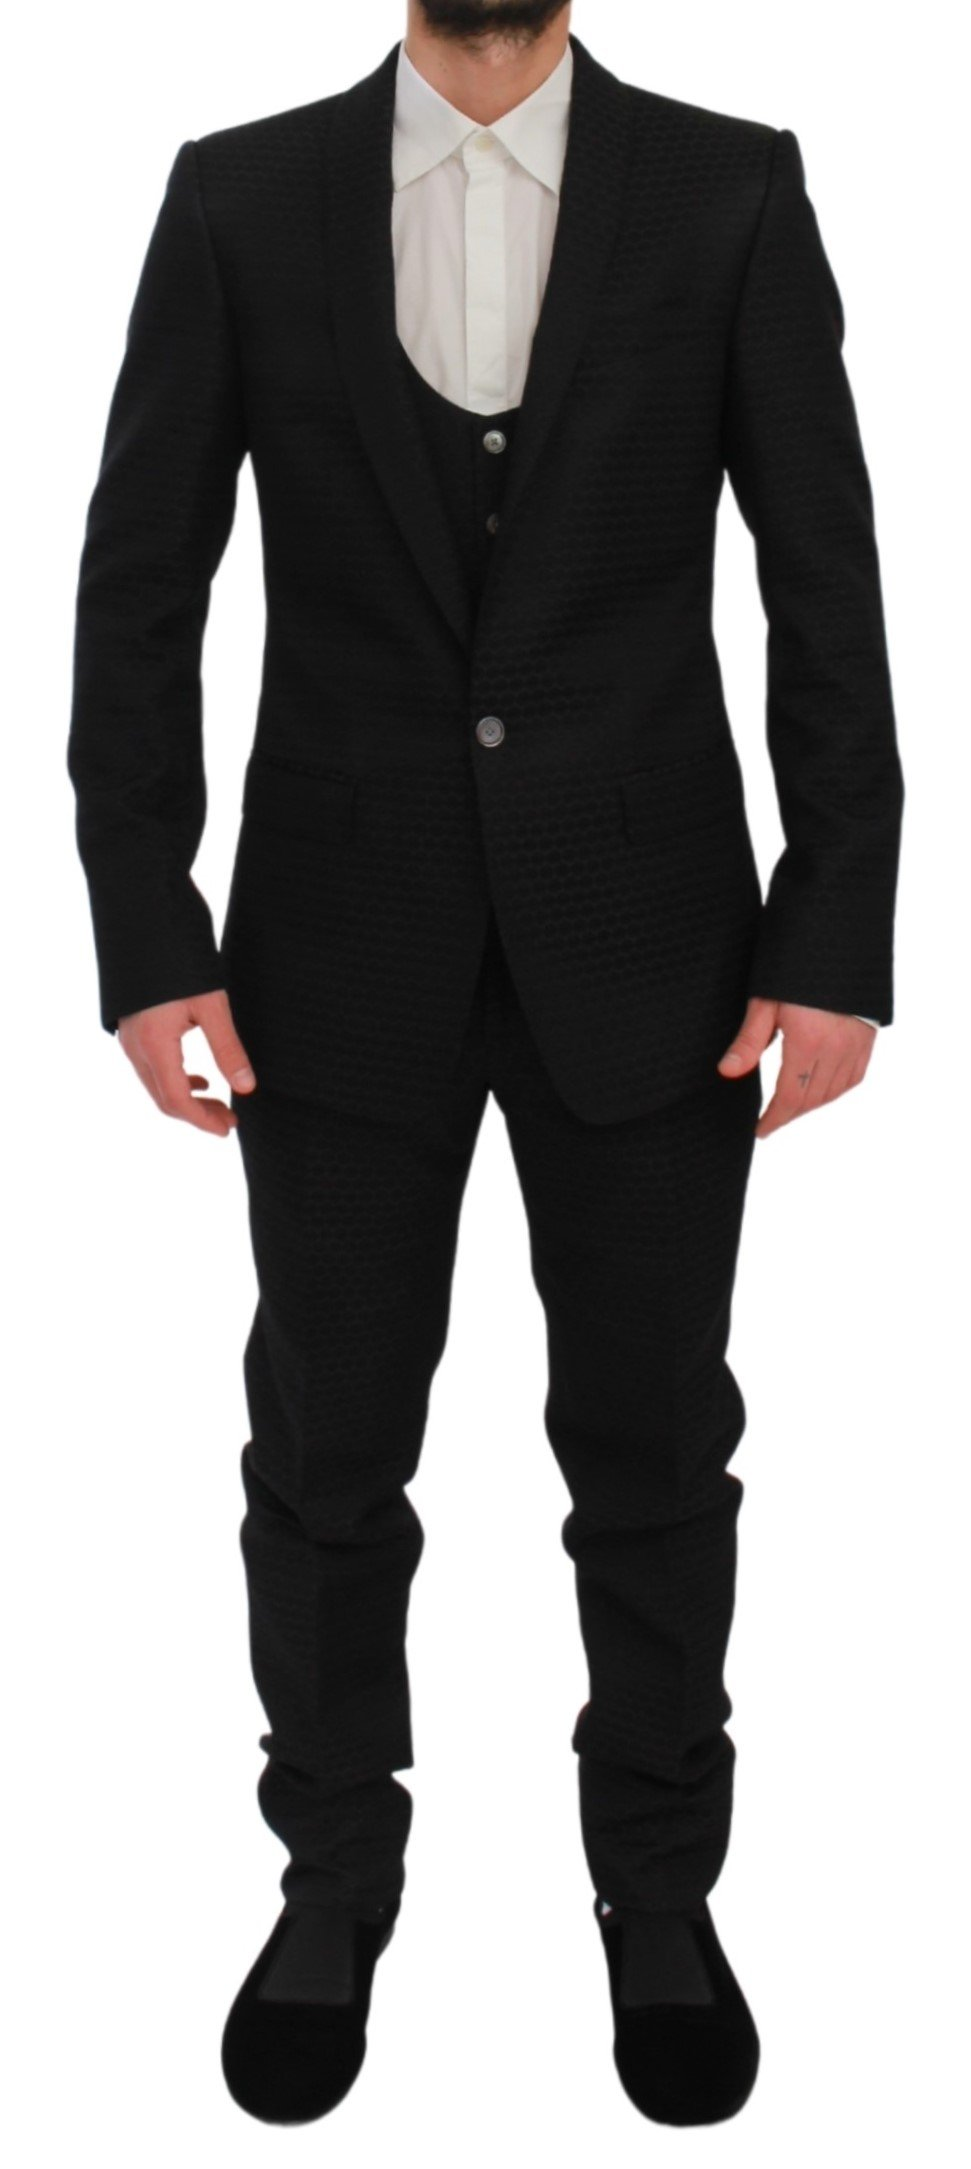 Dolce & Gabbana Men's Slim Fit 3 Piece Wool MARTINI Suit Black KOS1715 - IT44 | XS